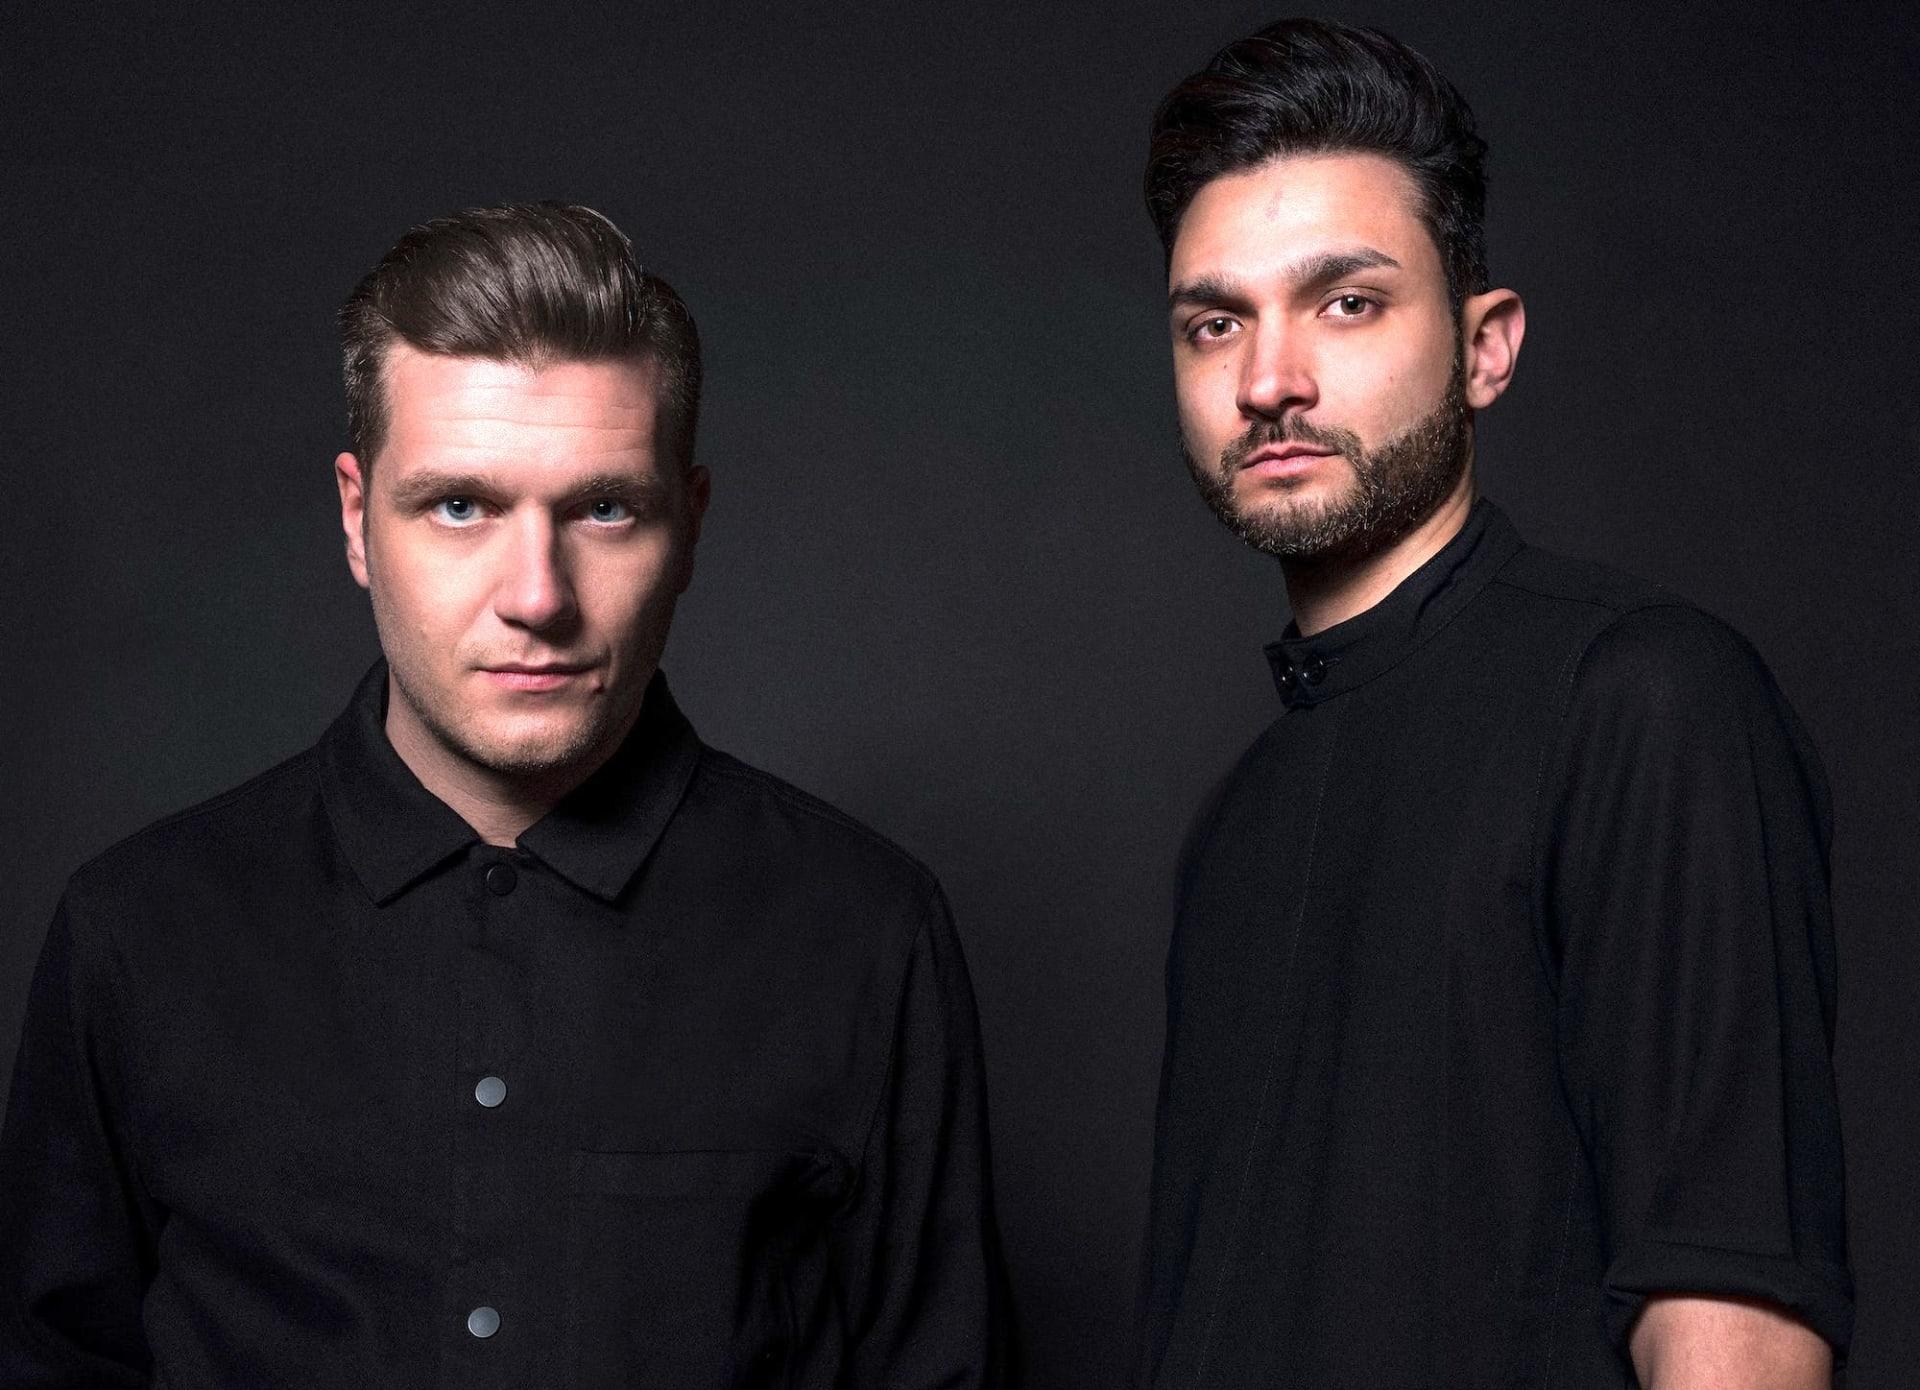 Swiss techno duo Adriatique. Photo by Raphael Rapior